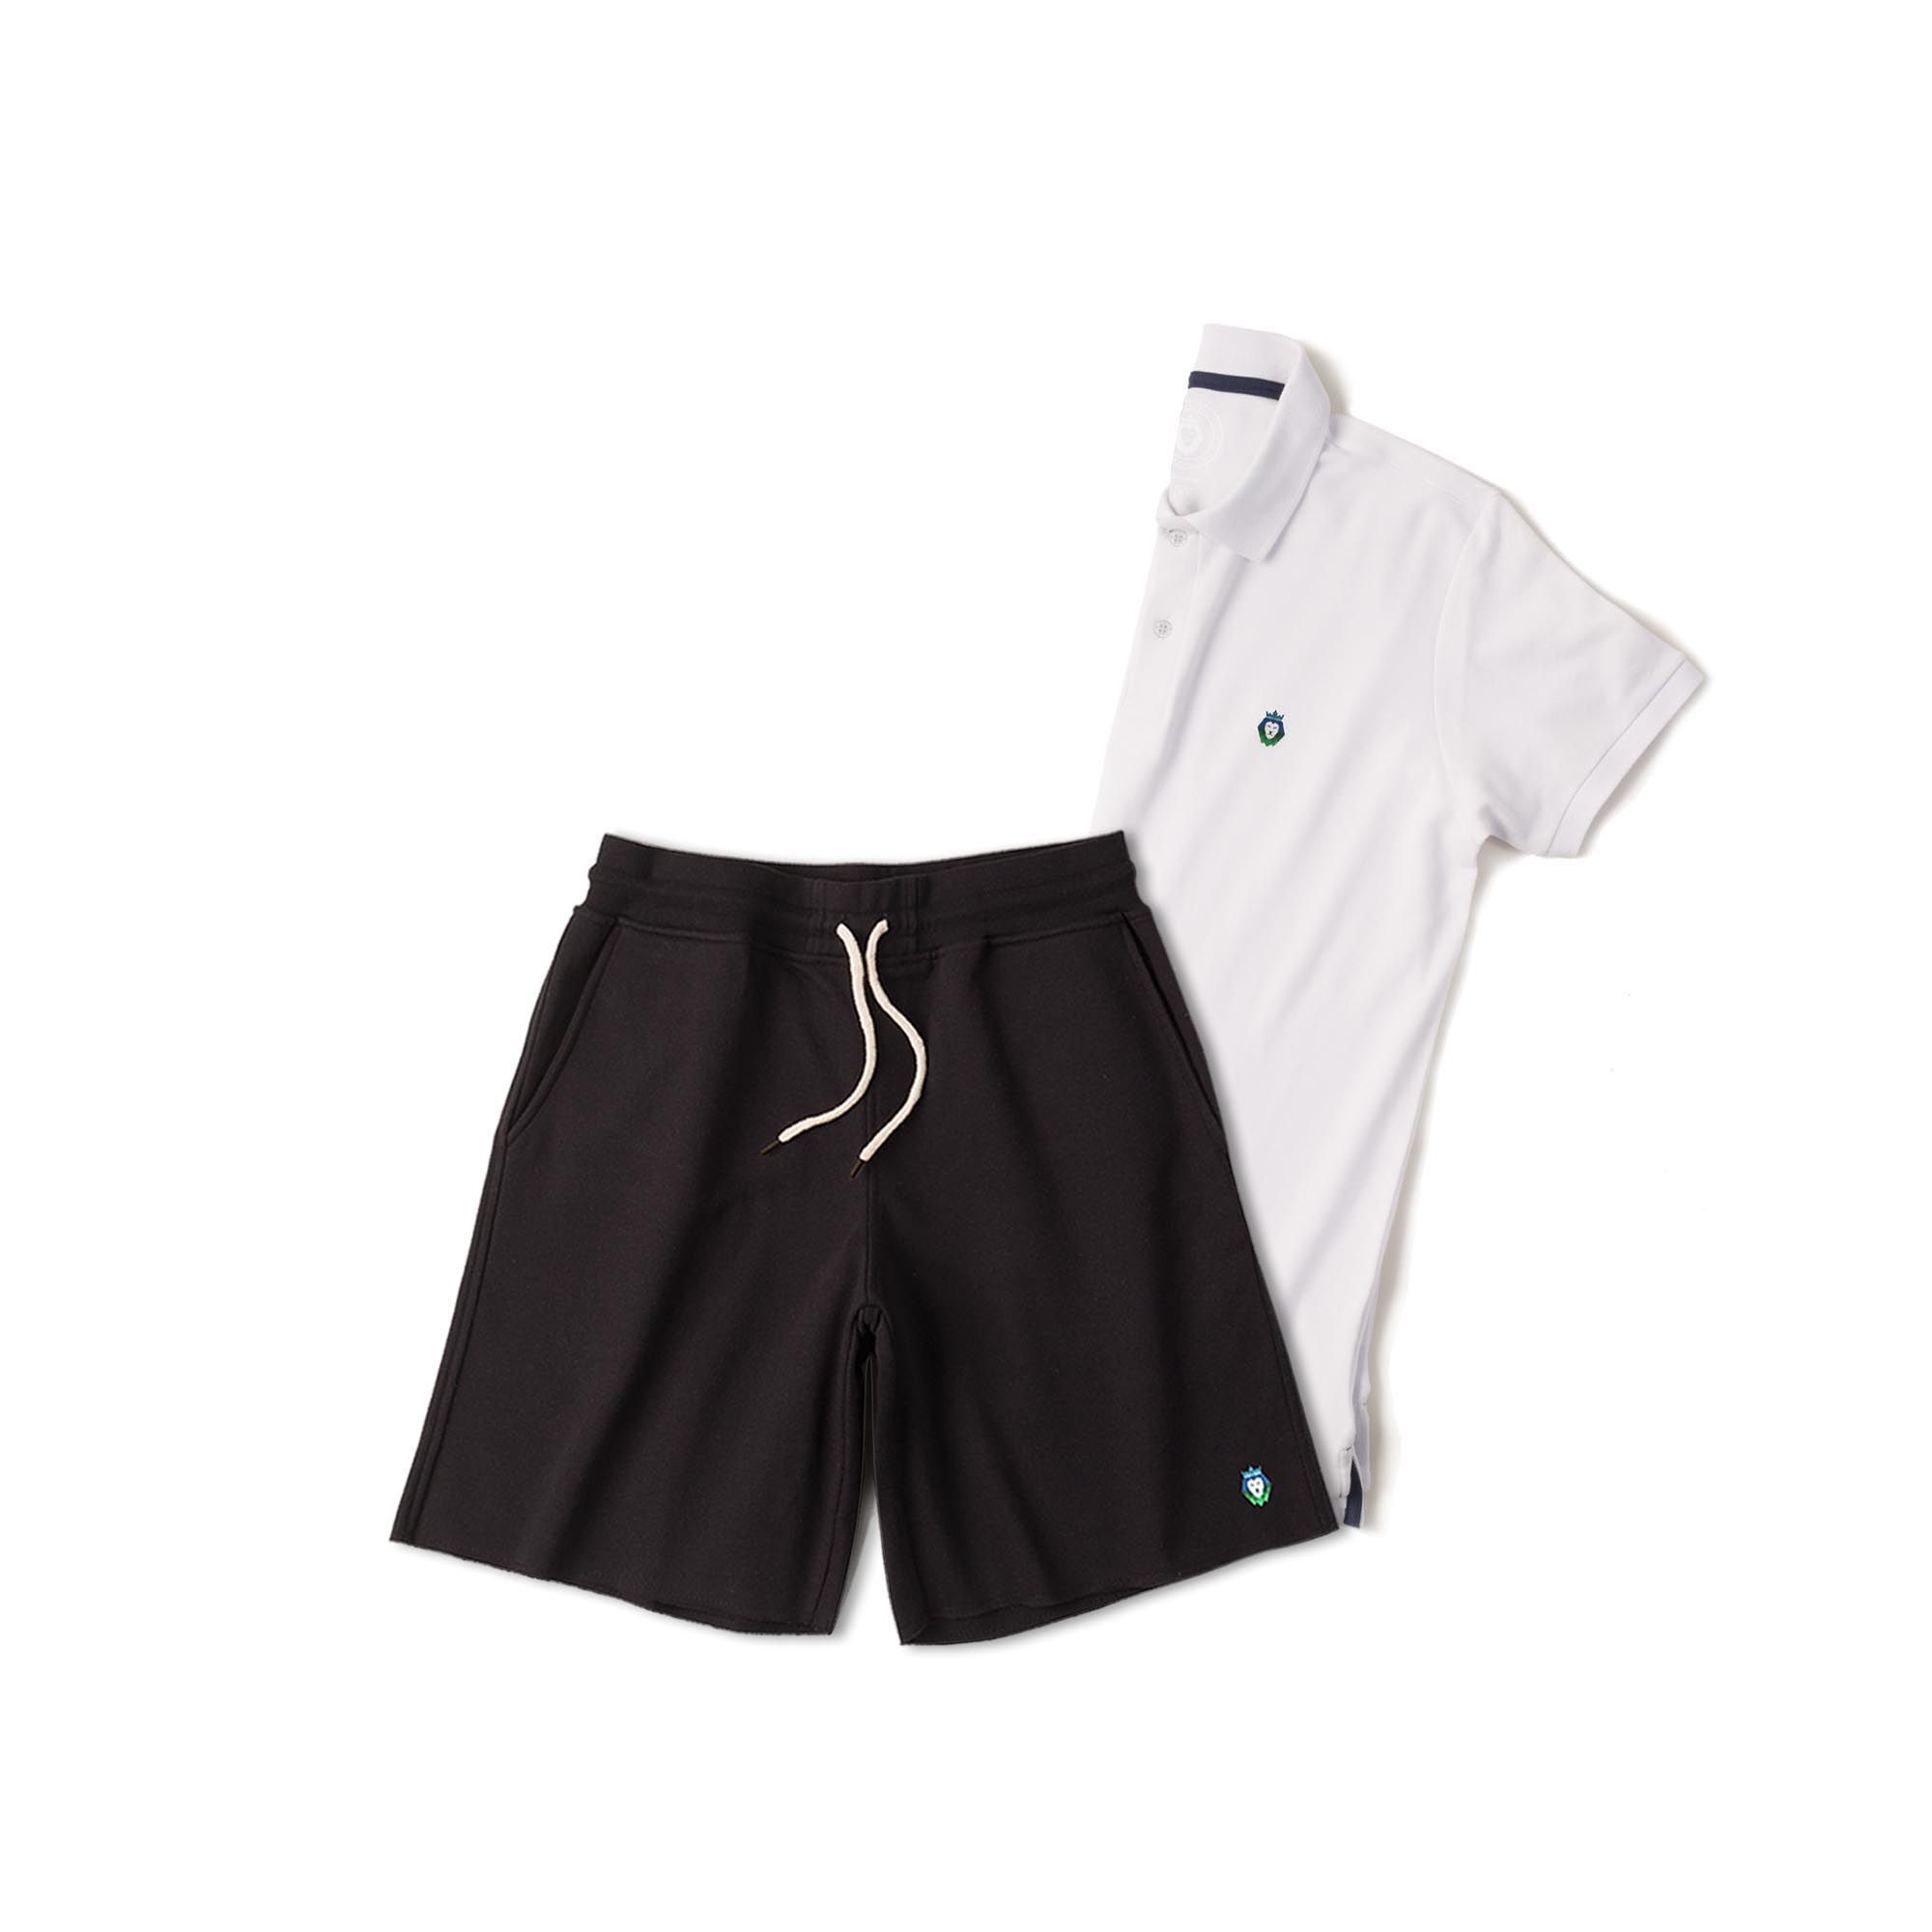 Kit 1 Bermuda Basic Preta + 1 Camisa Polo Style Branca Zaiden Masculina